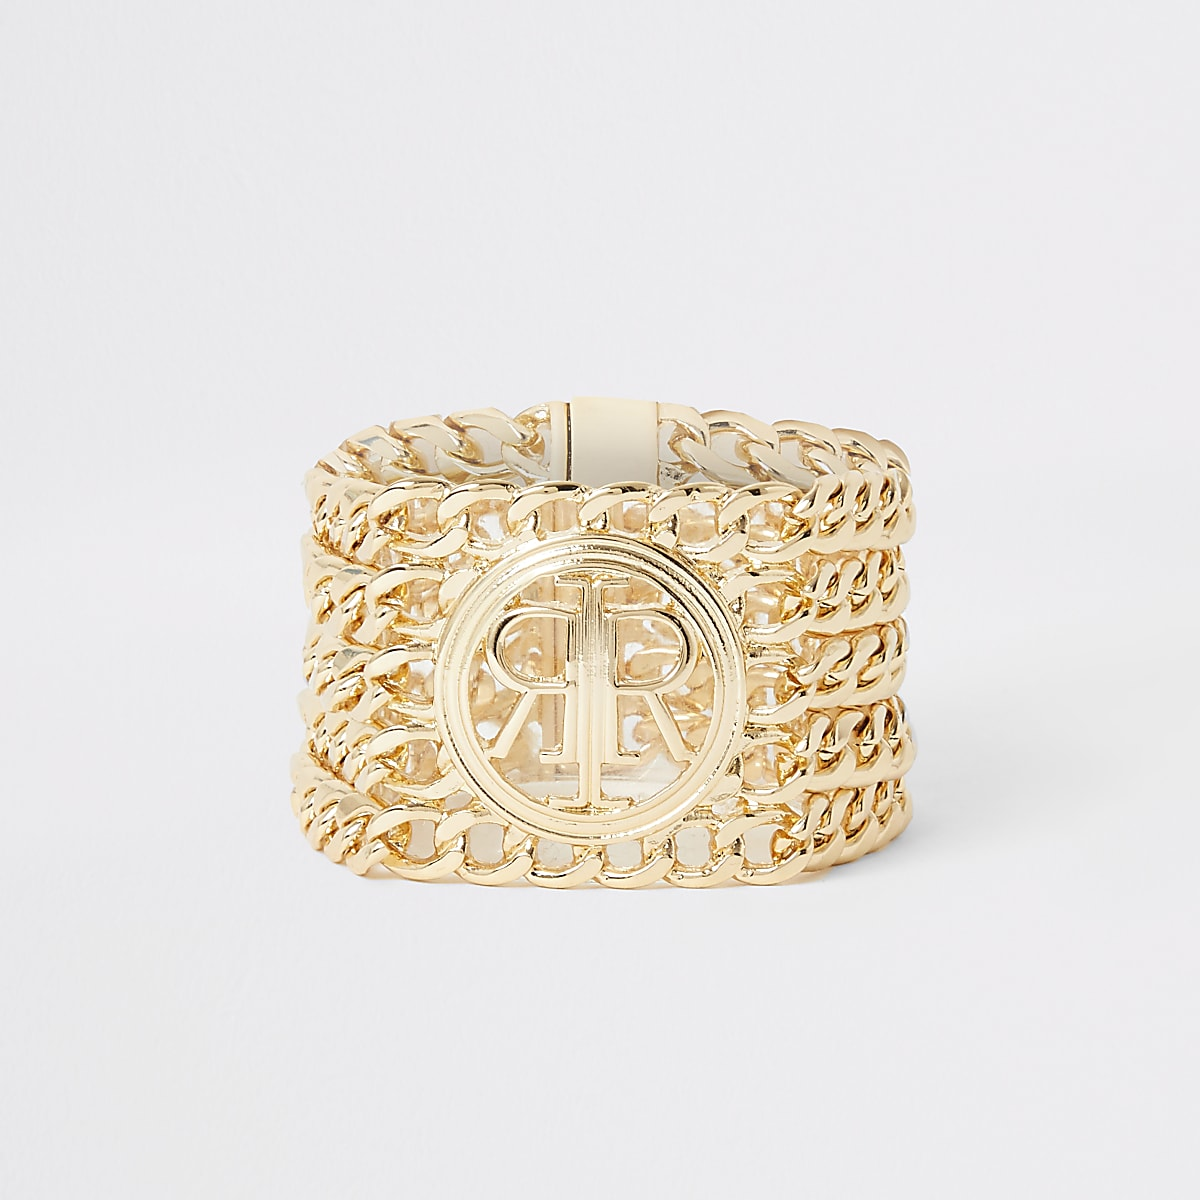 Goudkleurige met kettingen gelaagde armband en RI-logo